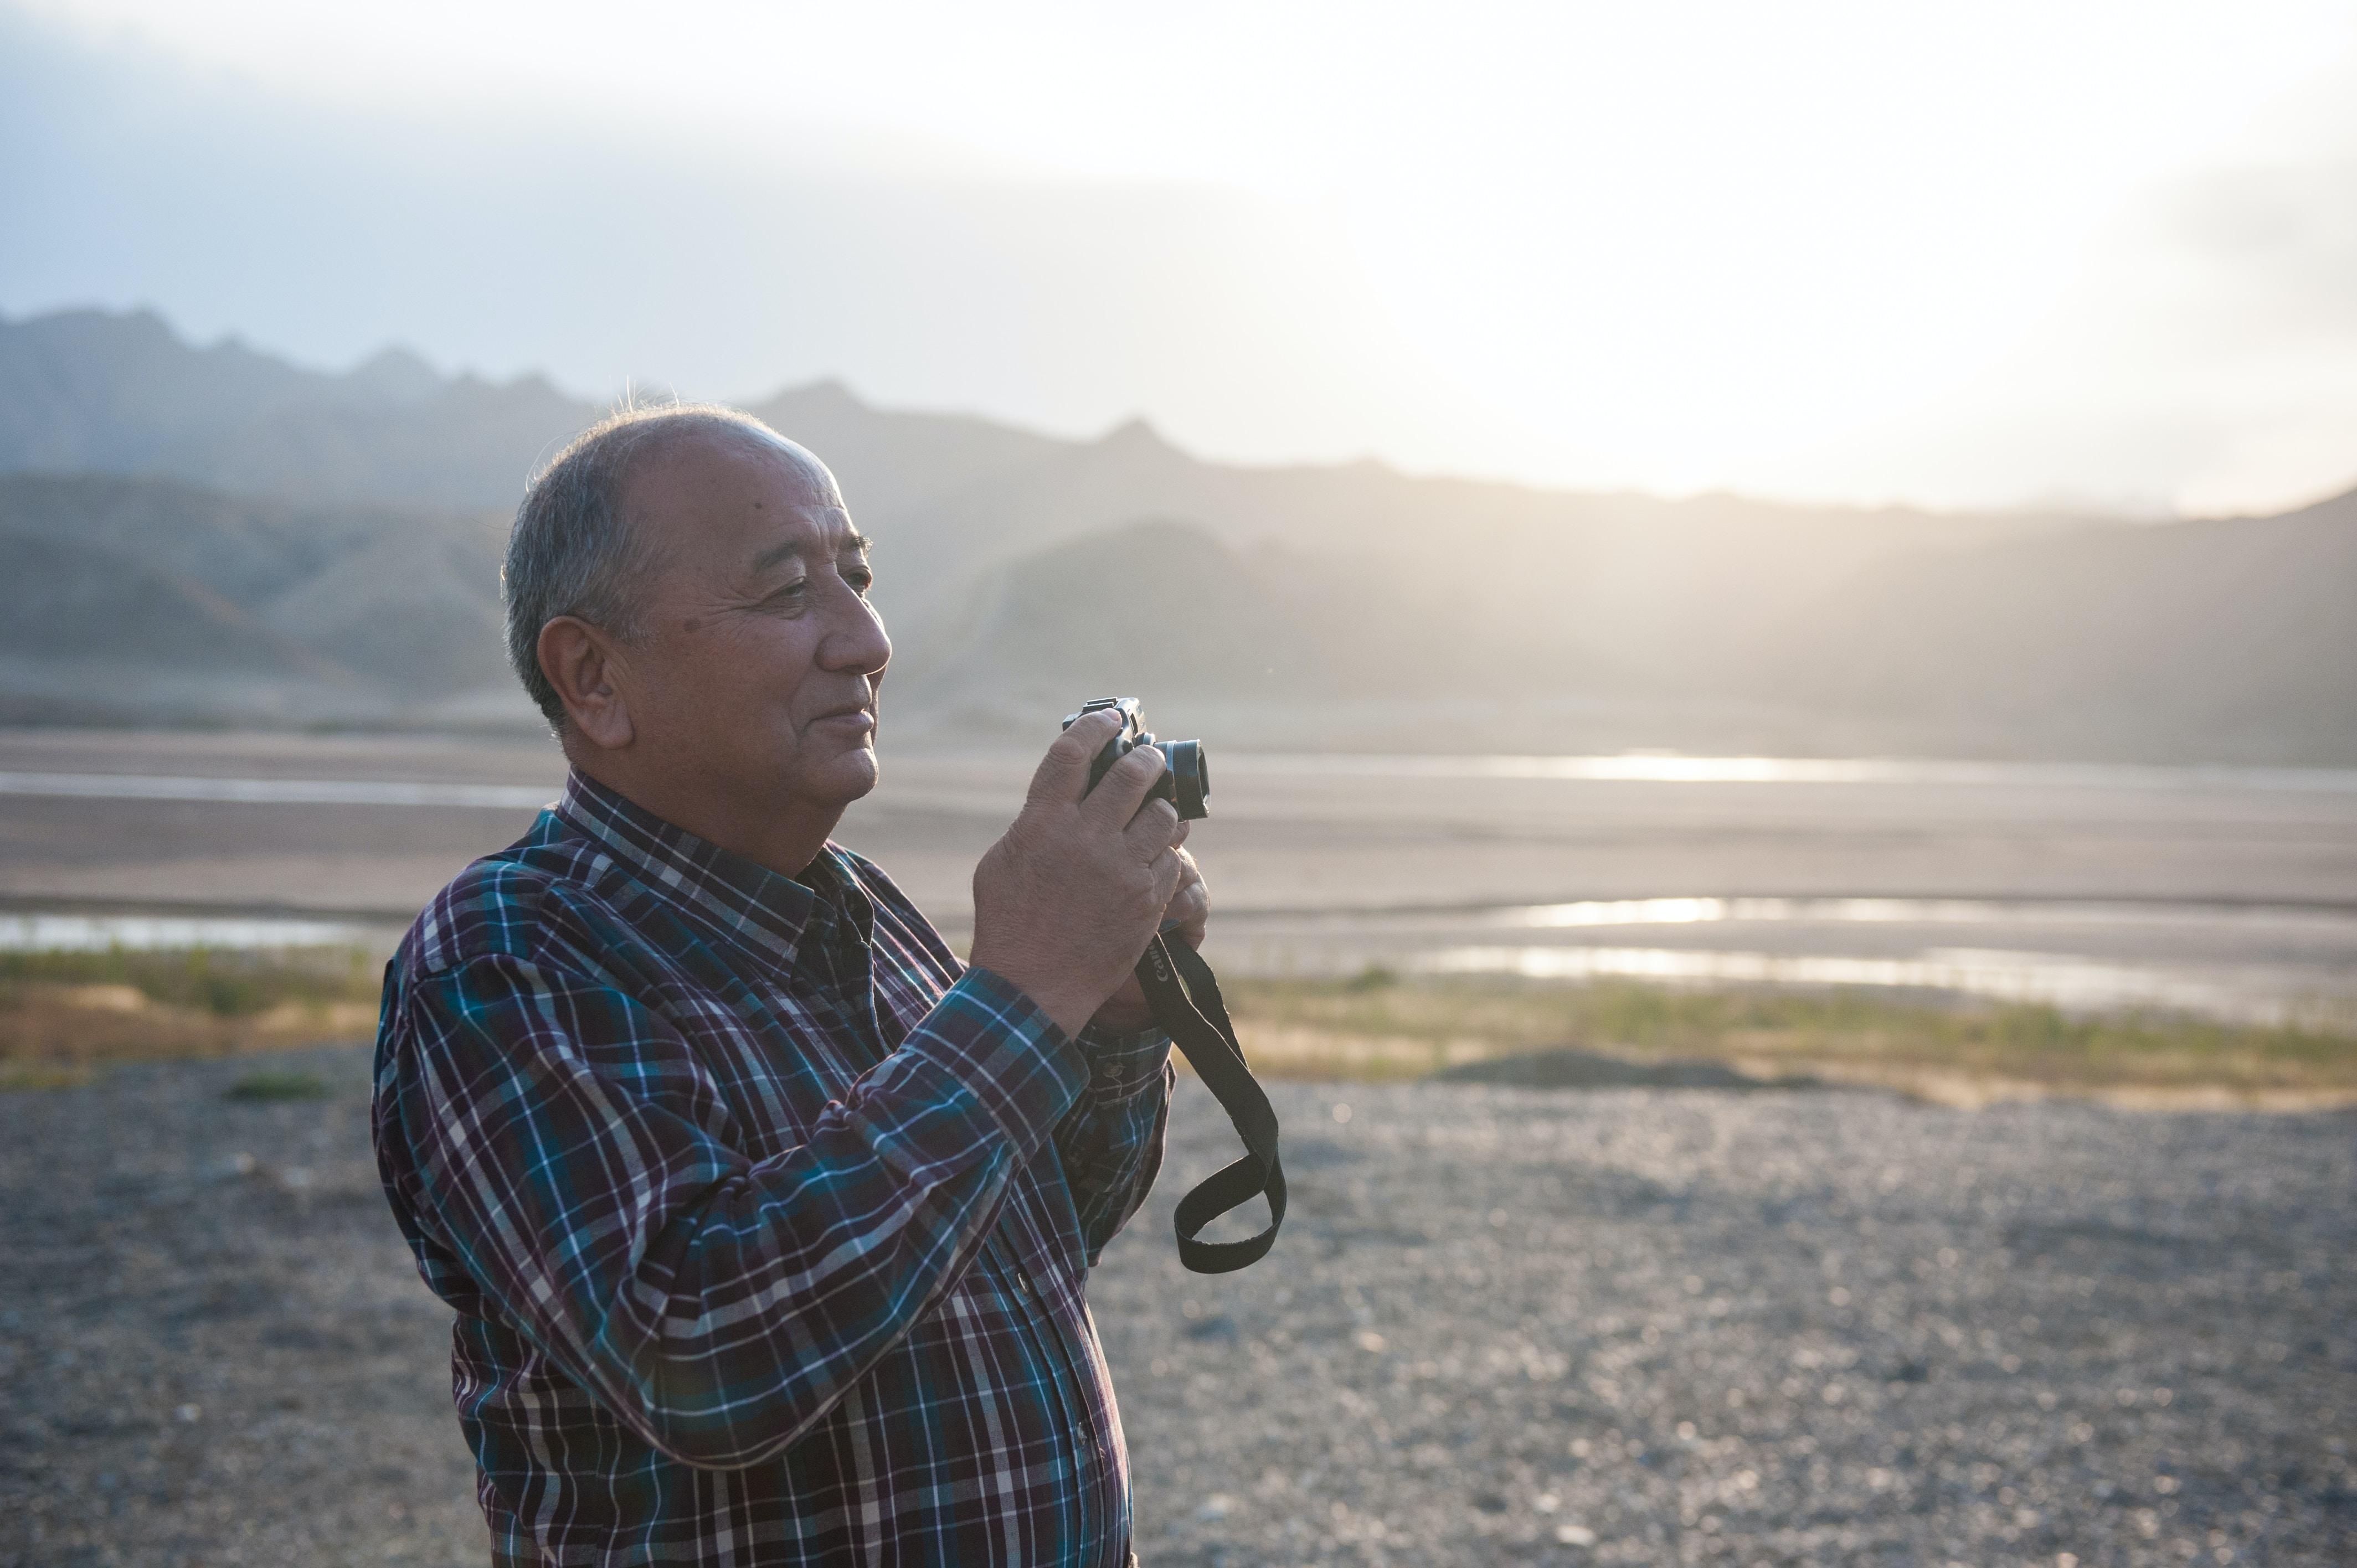 Old man in checkered shirt holding a photo camera at Torgayti Village